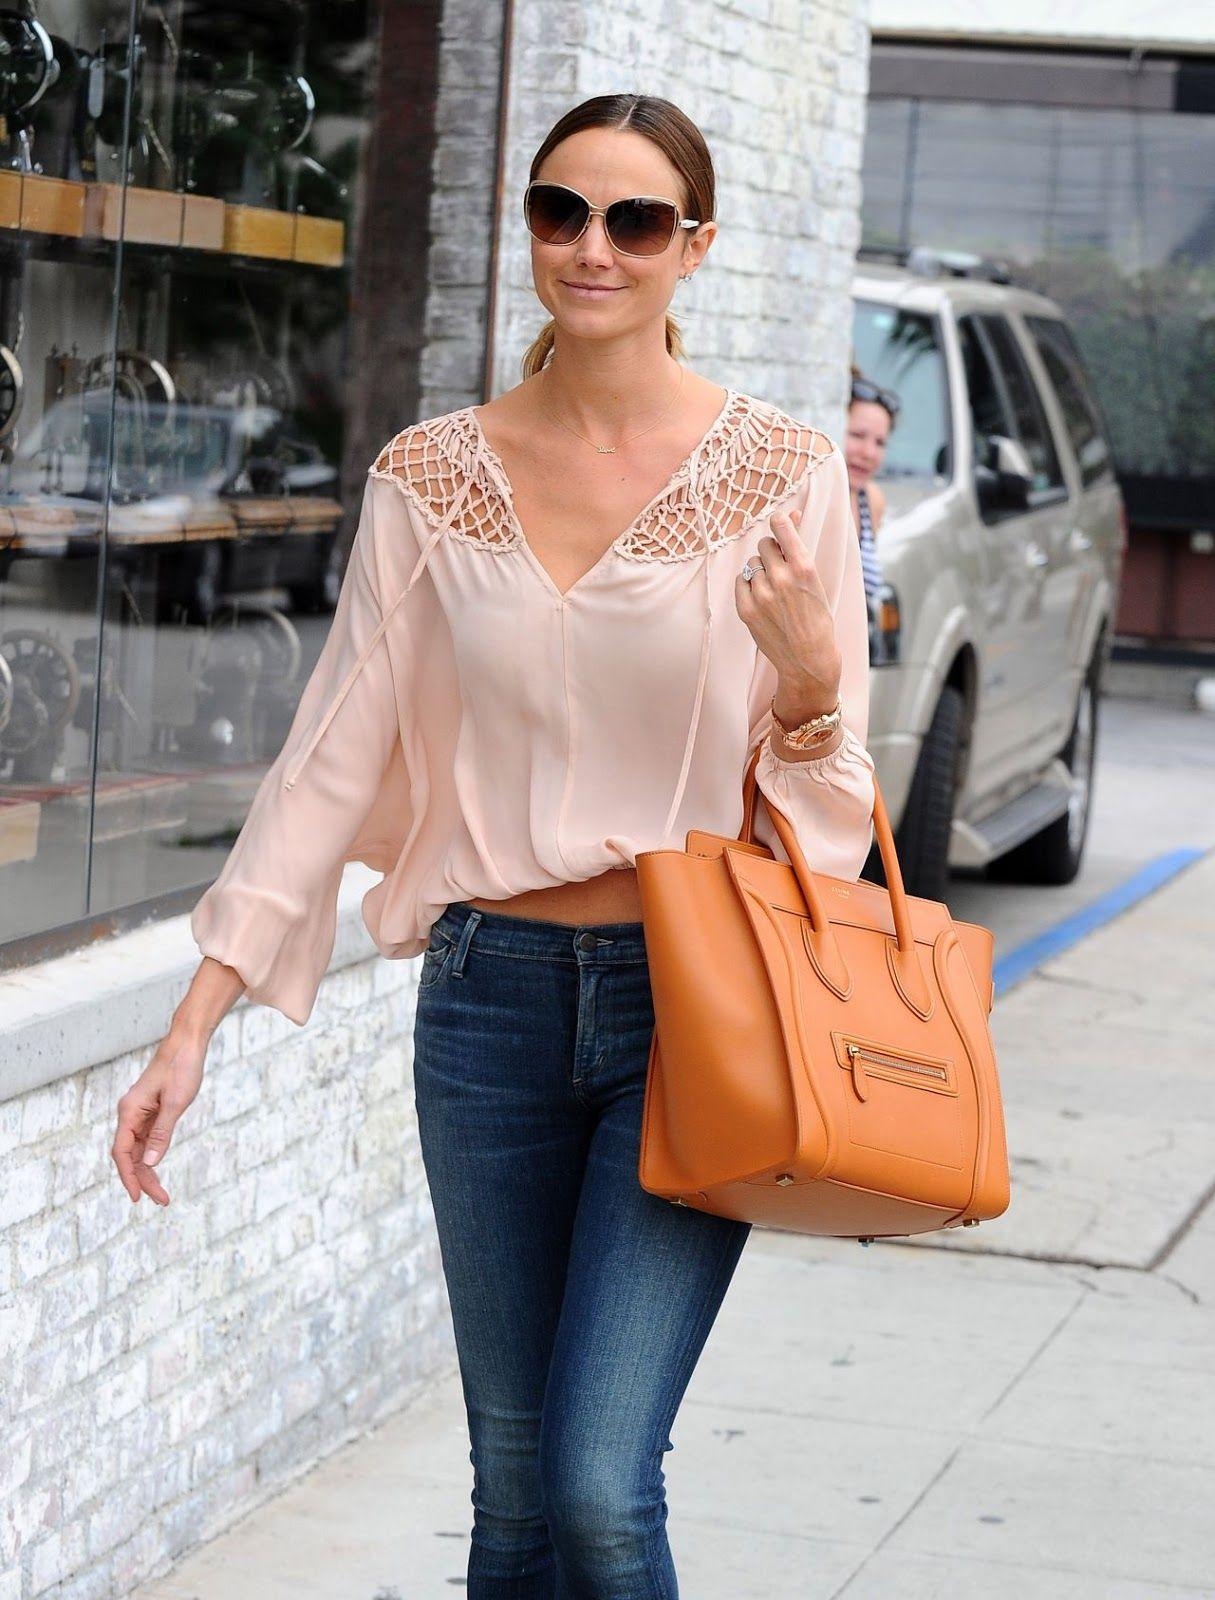 Stacy Keibler Street Style | Outlet Value Blog